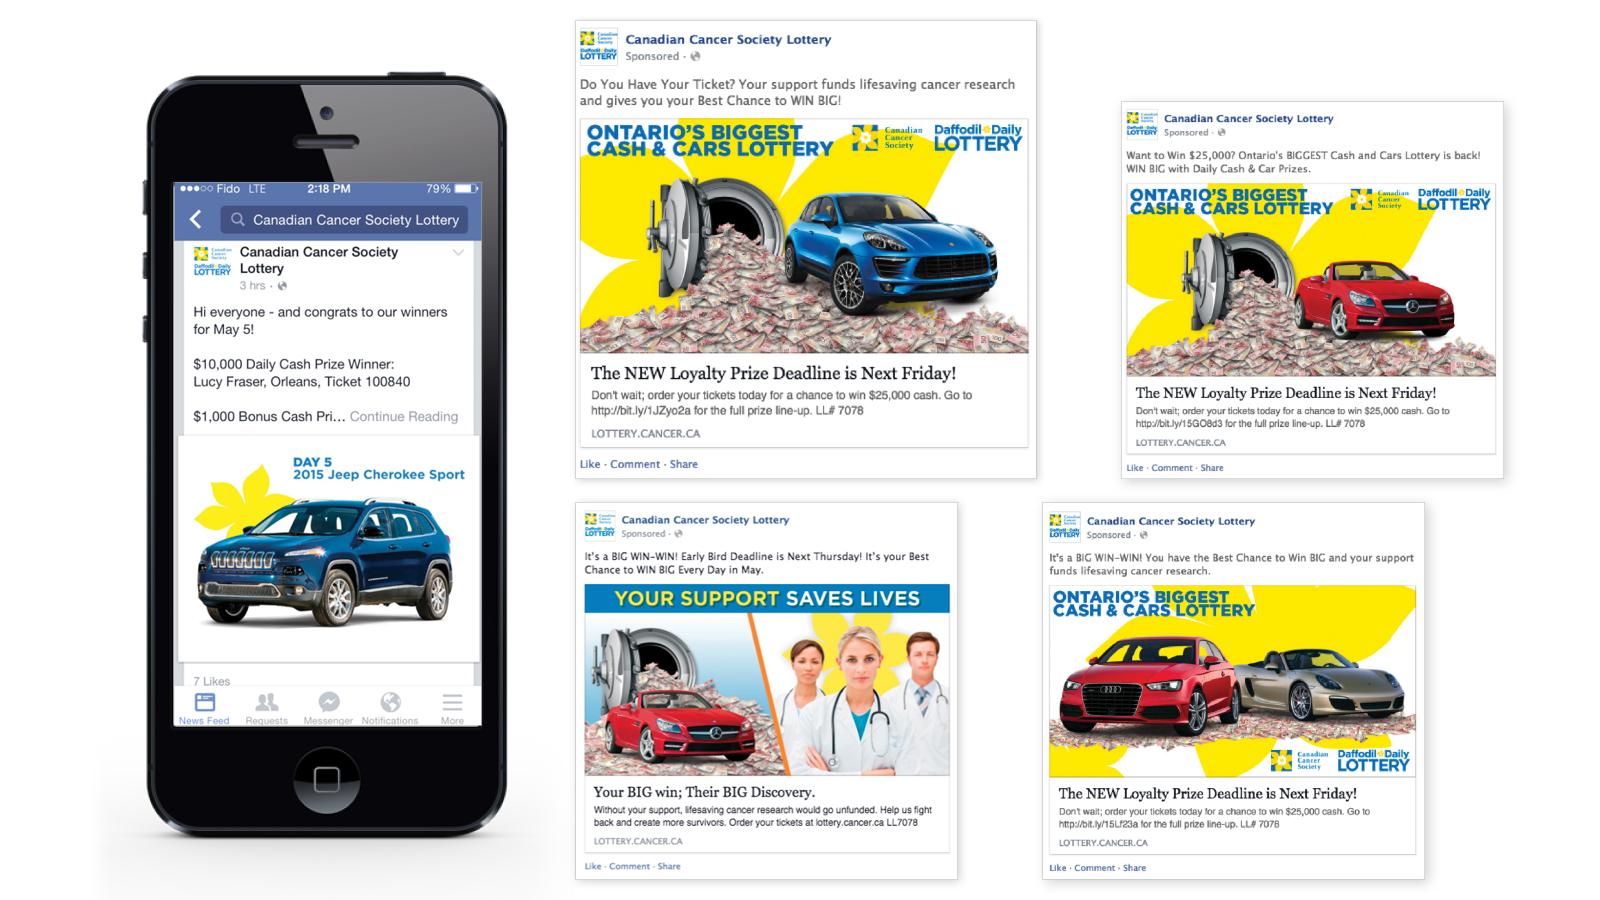 Canadian Cancer Society Lottery | The Canadian Cancer Society Lottery | Digital Marketing, Facebook App Development, Social Media